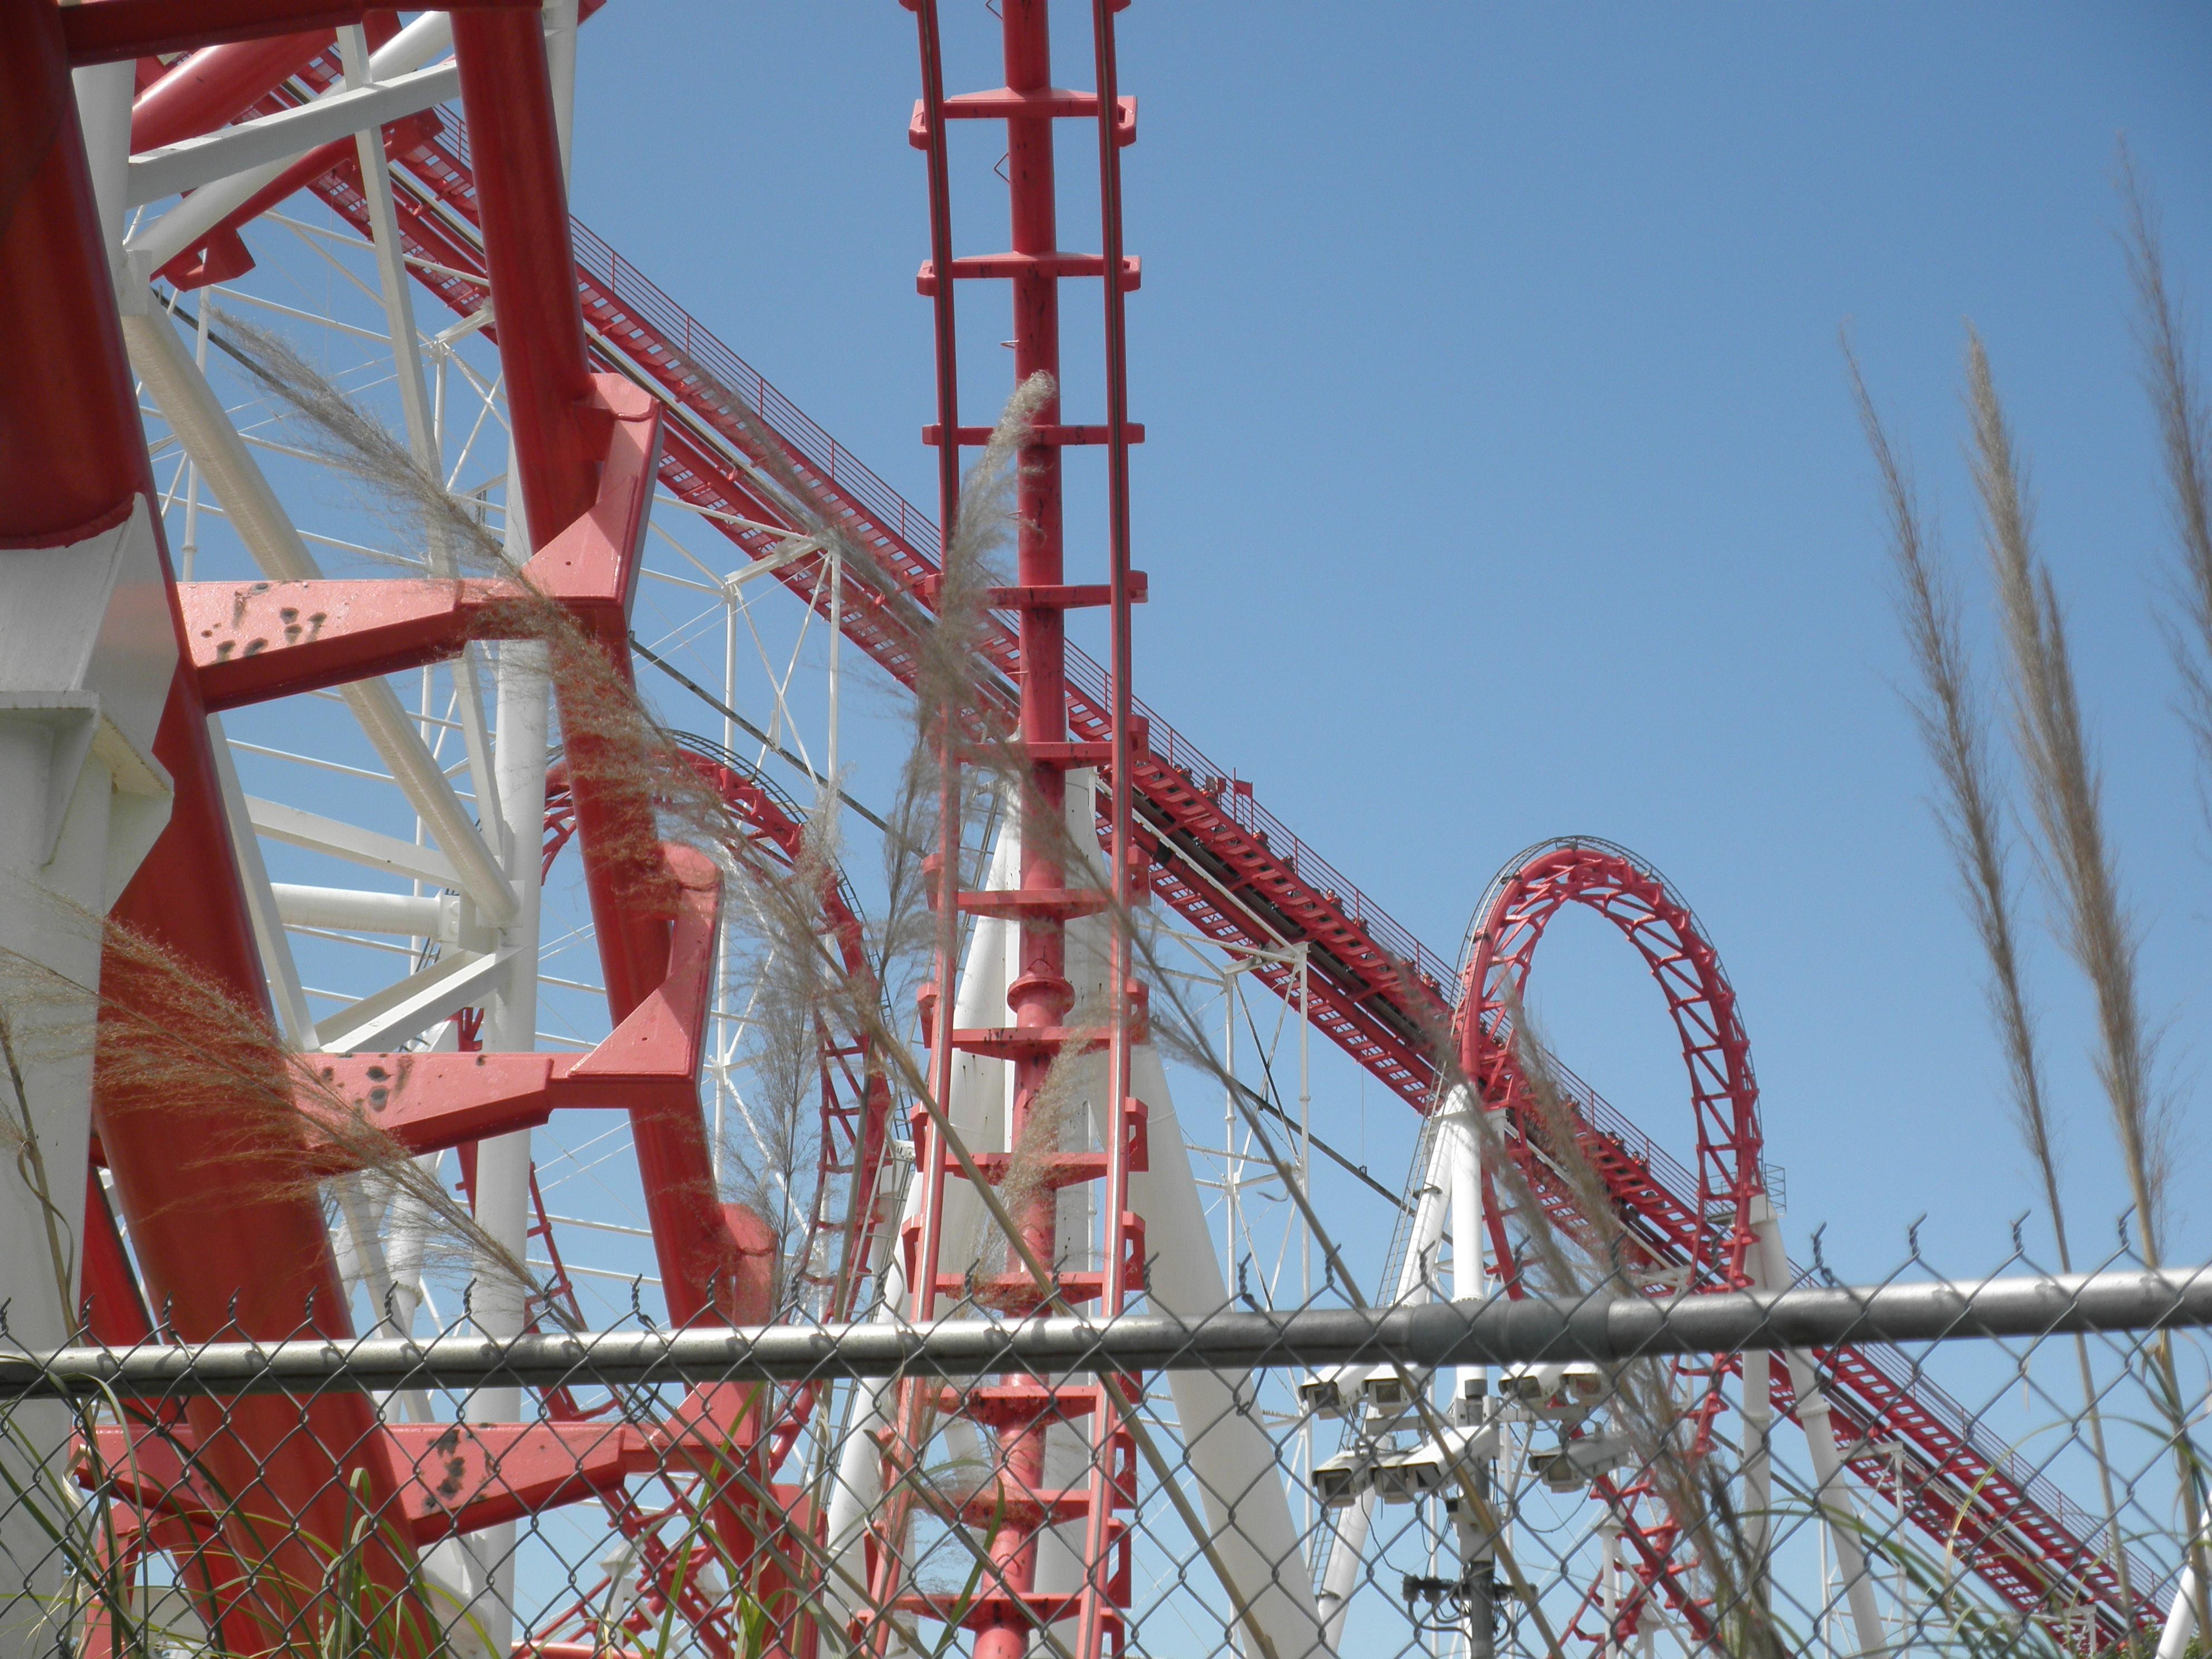 Up, up, and awaaayyy!! - Caltech